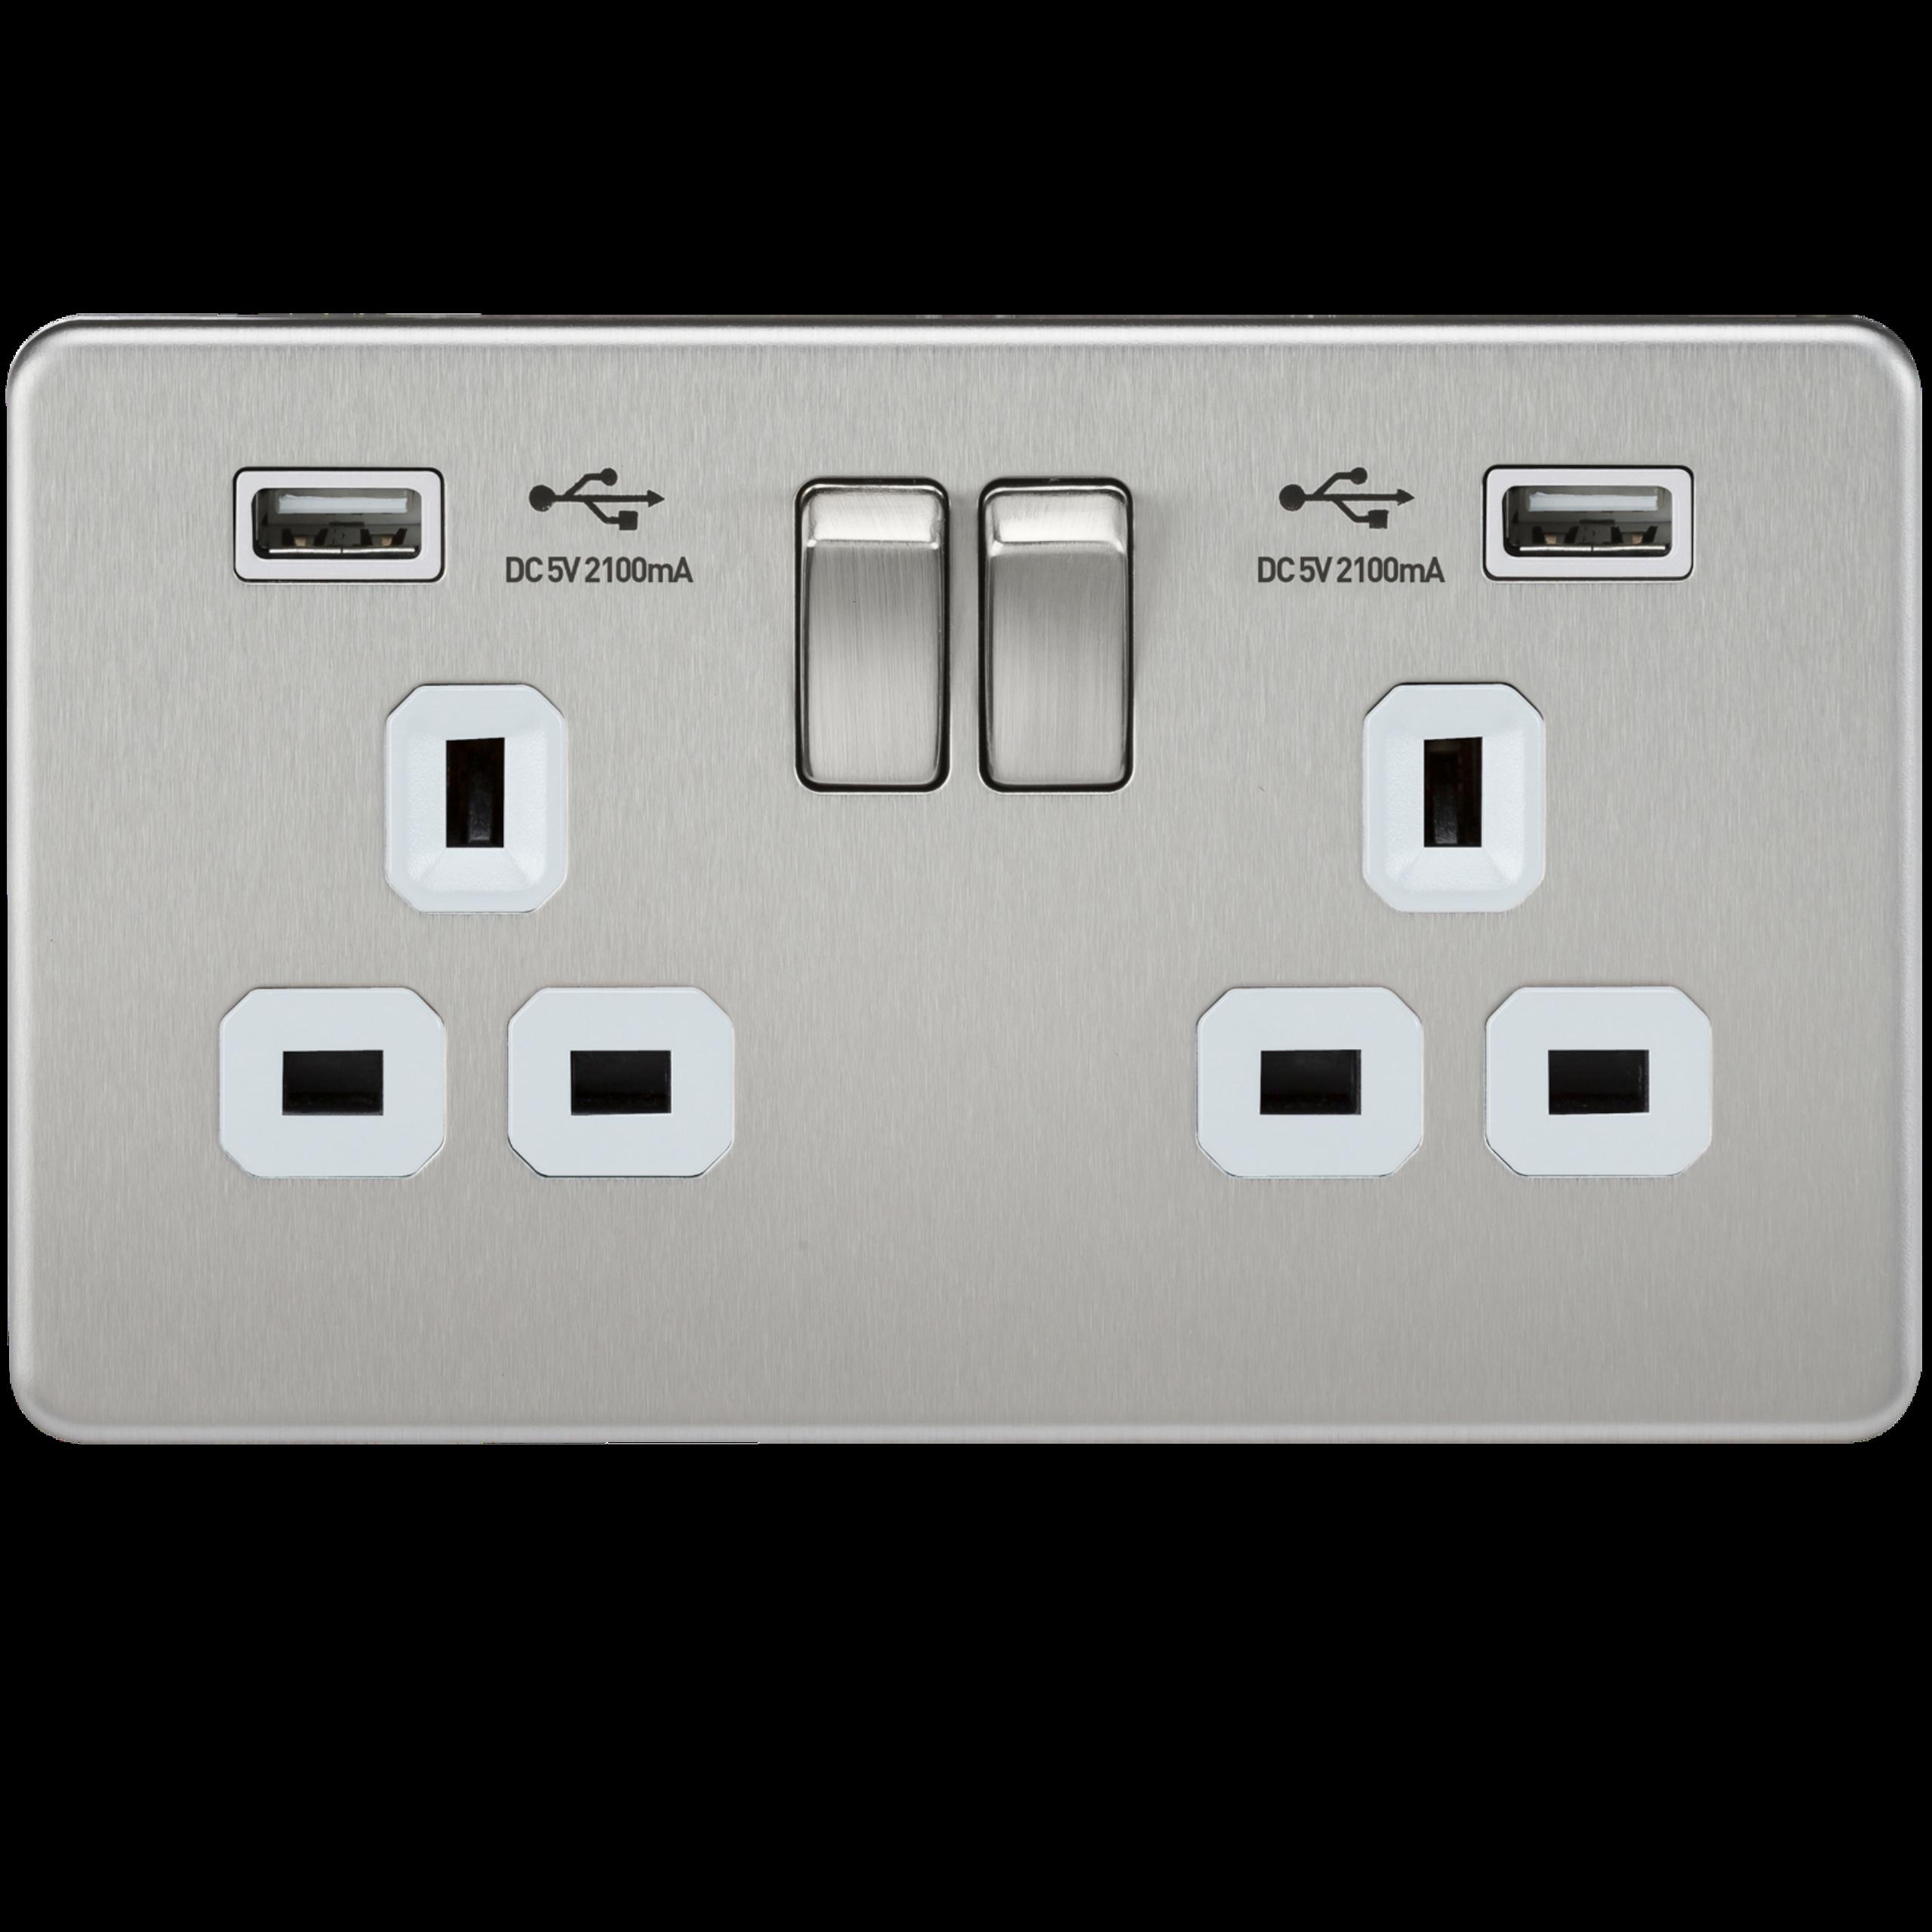 Knightsbridge 13A 2G Screwless Socket with Dual USB Charger Black Nickel